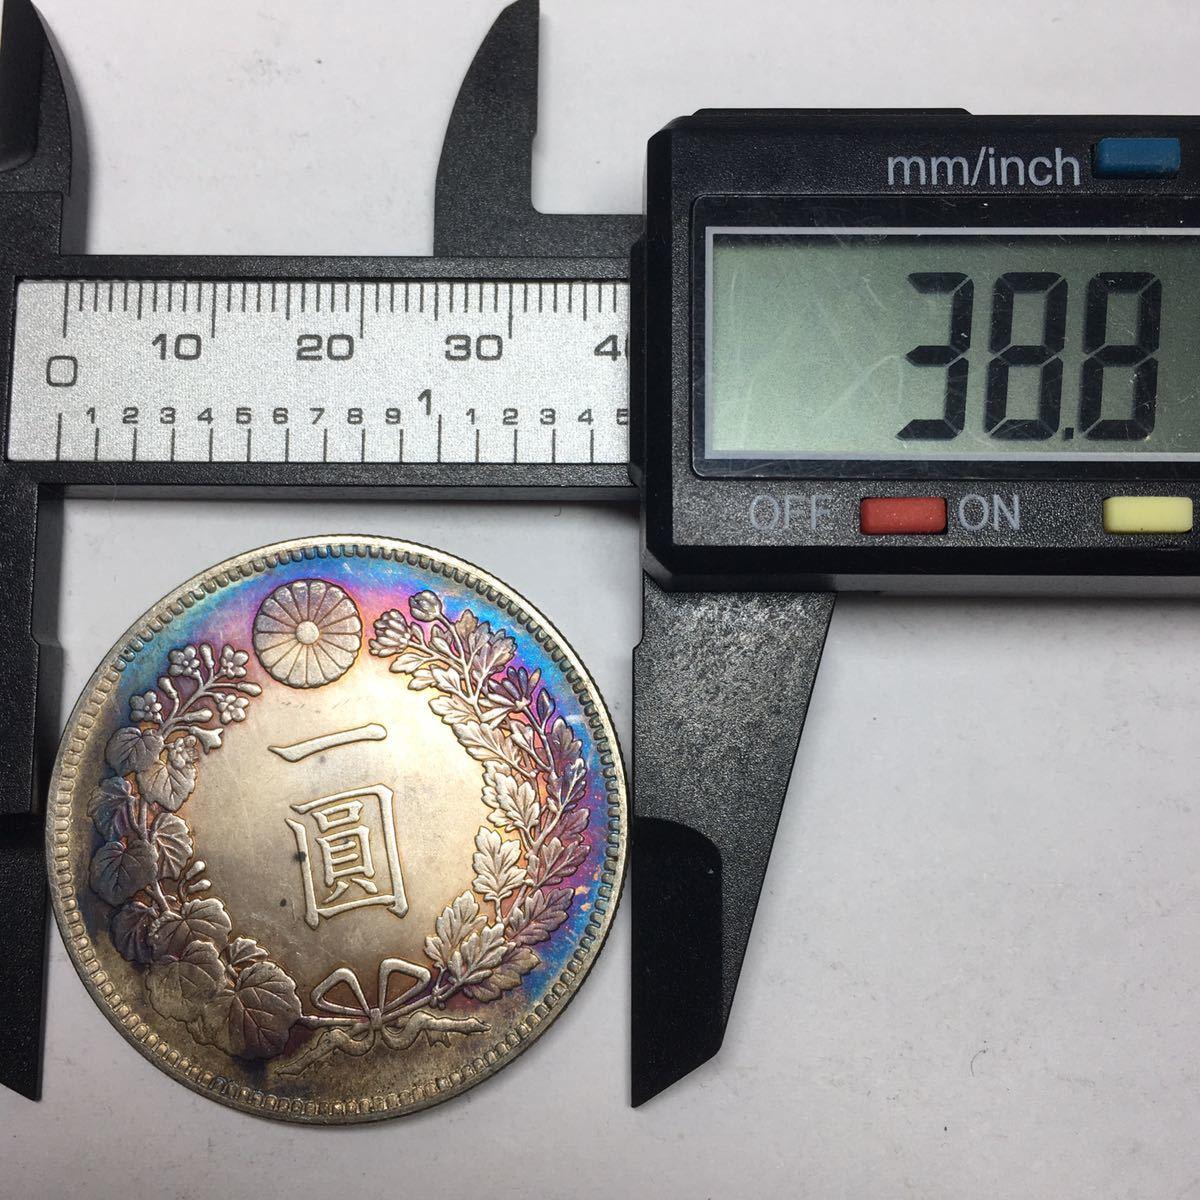 ES5-305 明治八年一円銀貨 日本古銭 量目26.45_画像5